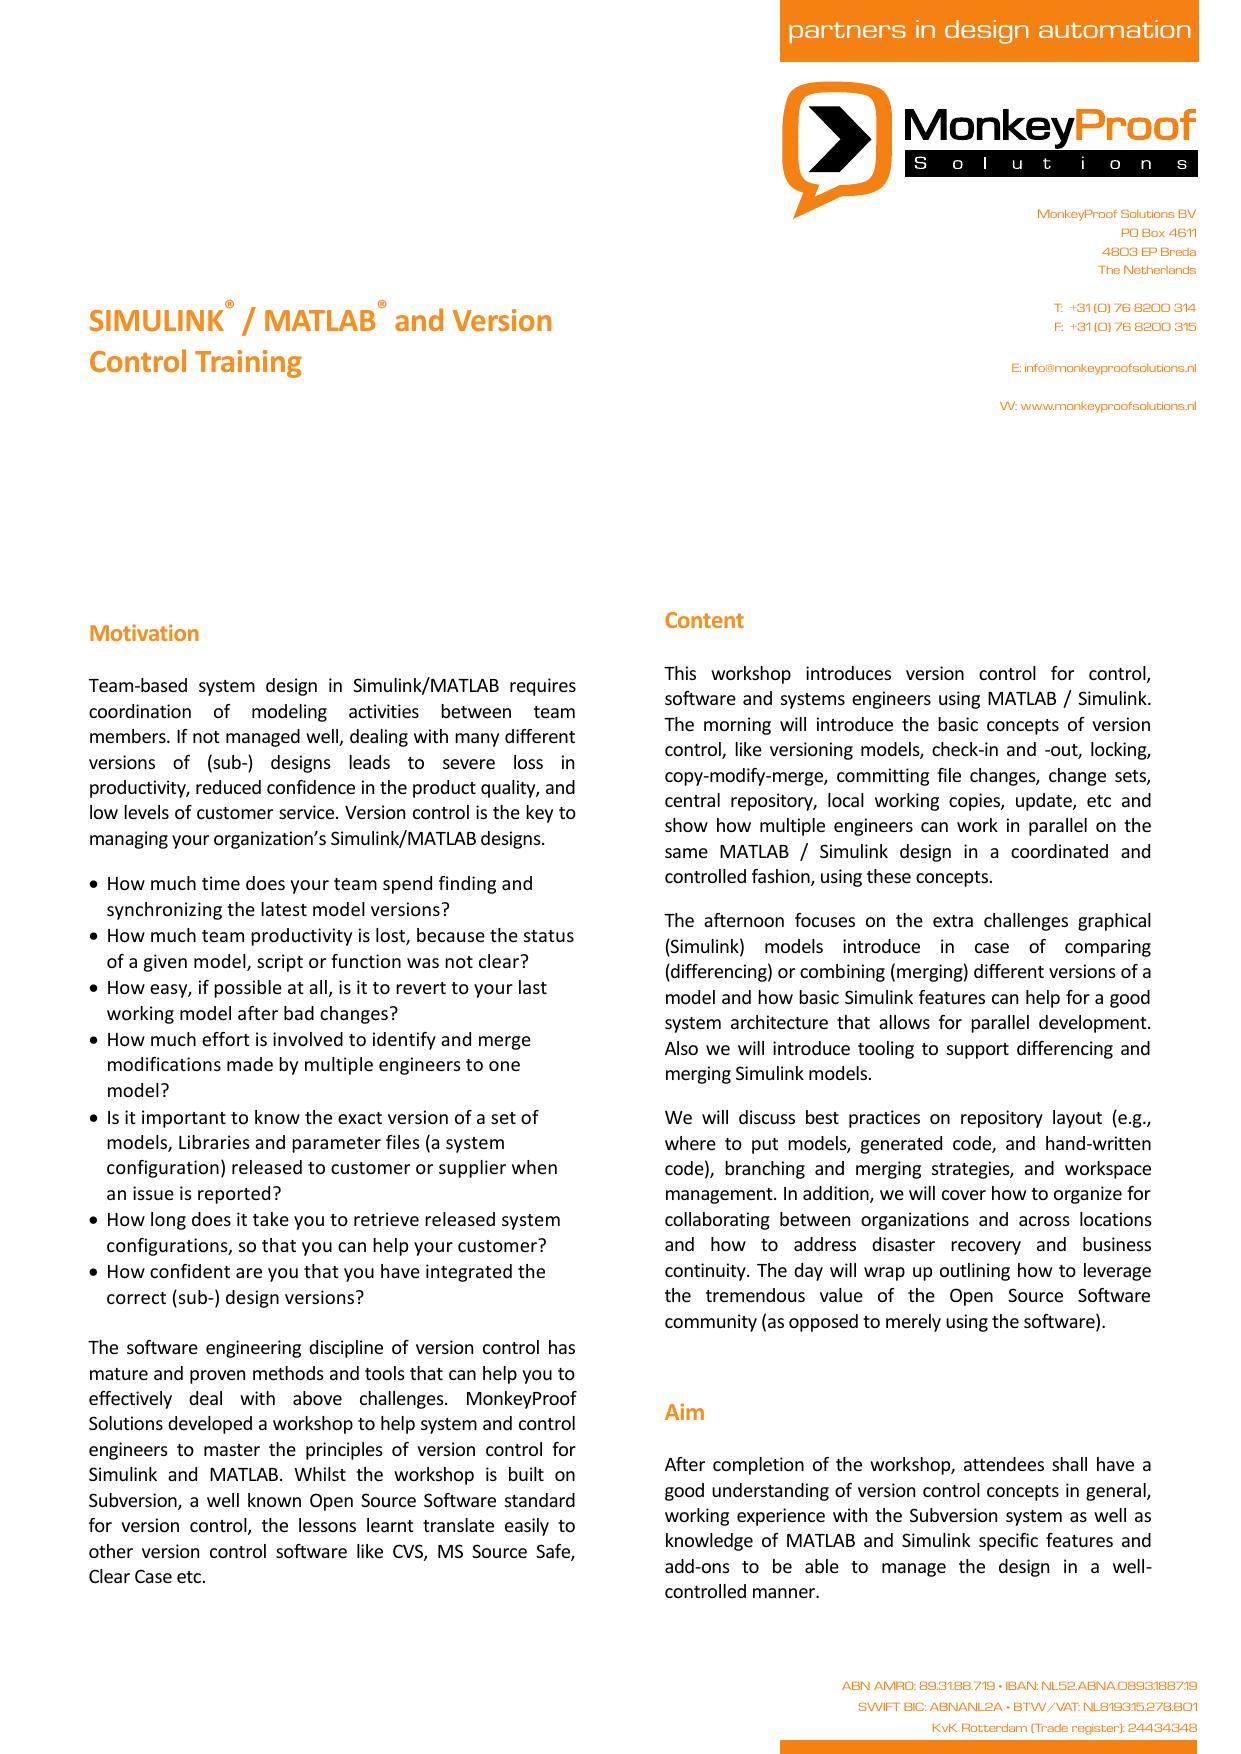 SIMULINK / MATLAB and Version Control Training | manualzz com